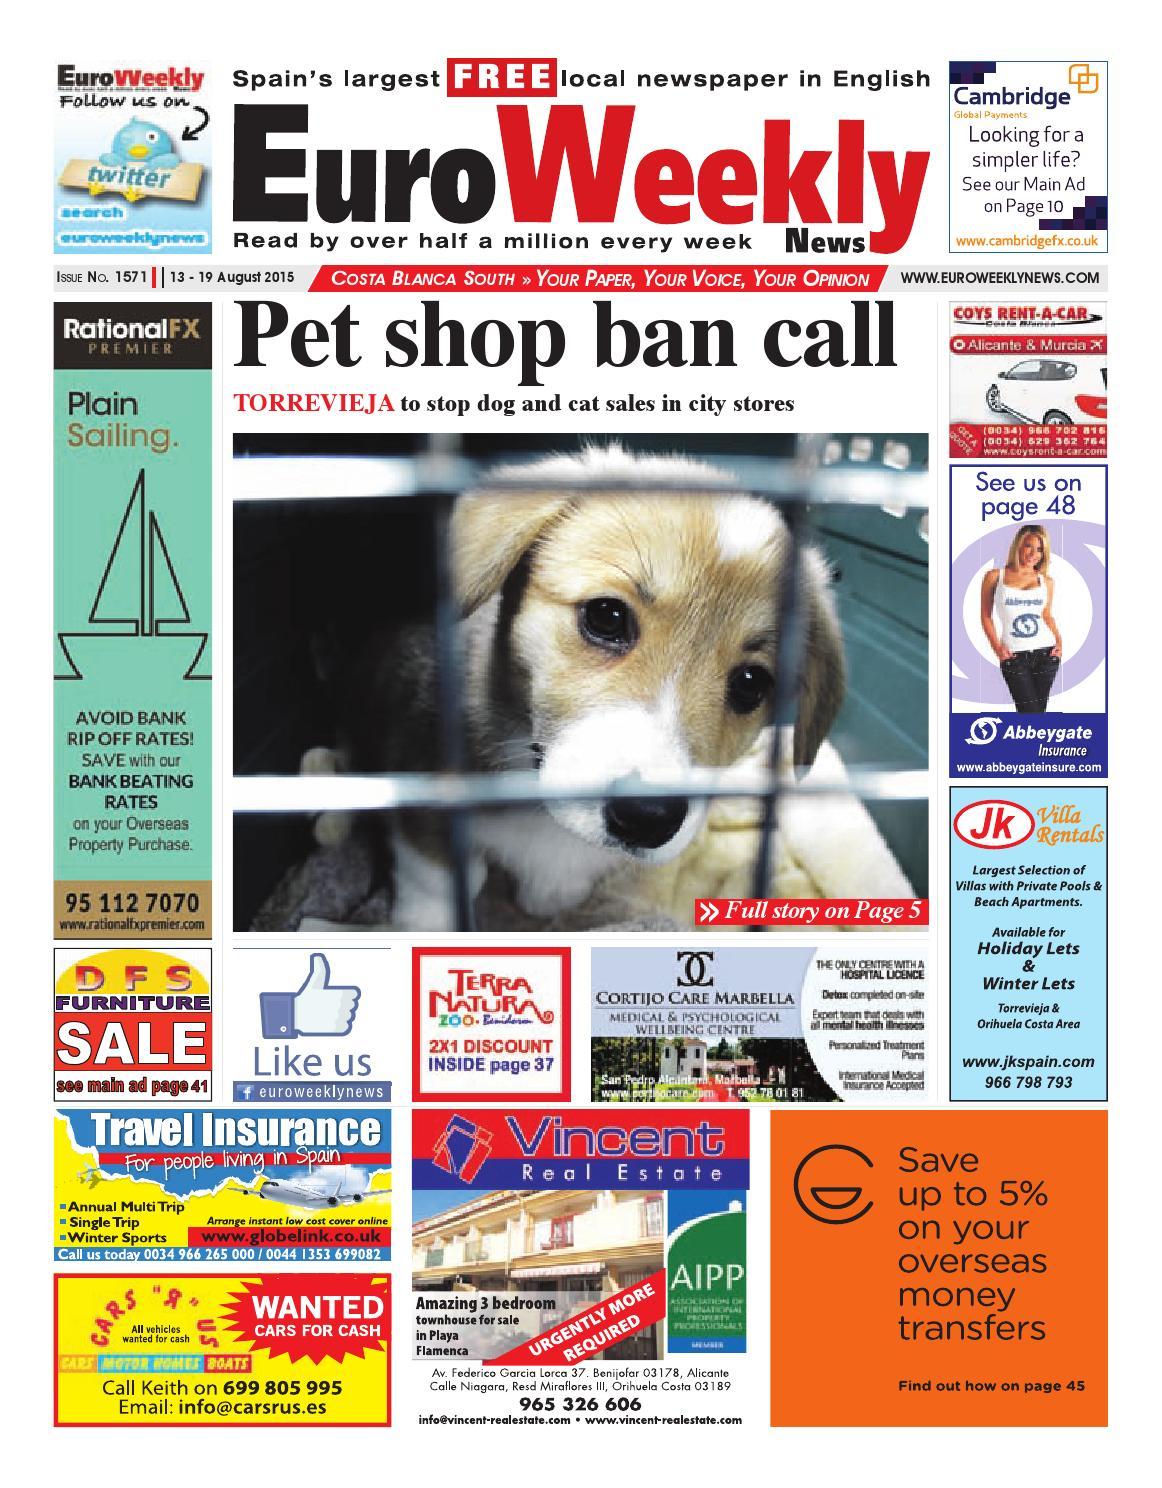 Ainhoa Madrid David Moreno Porno euro weekly news - costa blanca south 13 - 19 august 2015